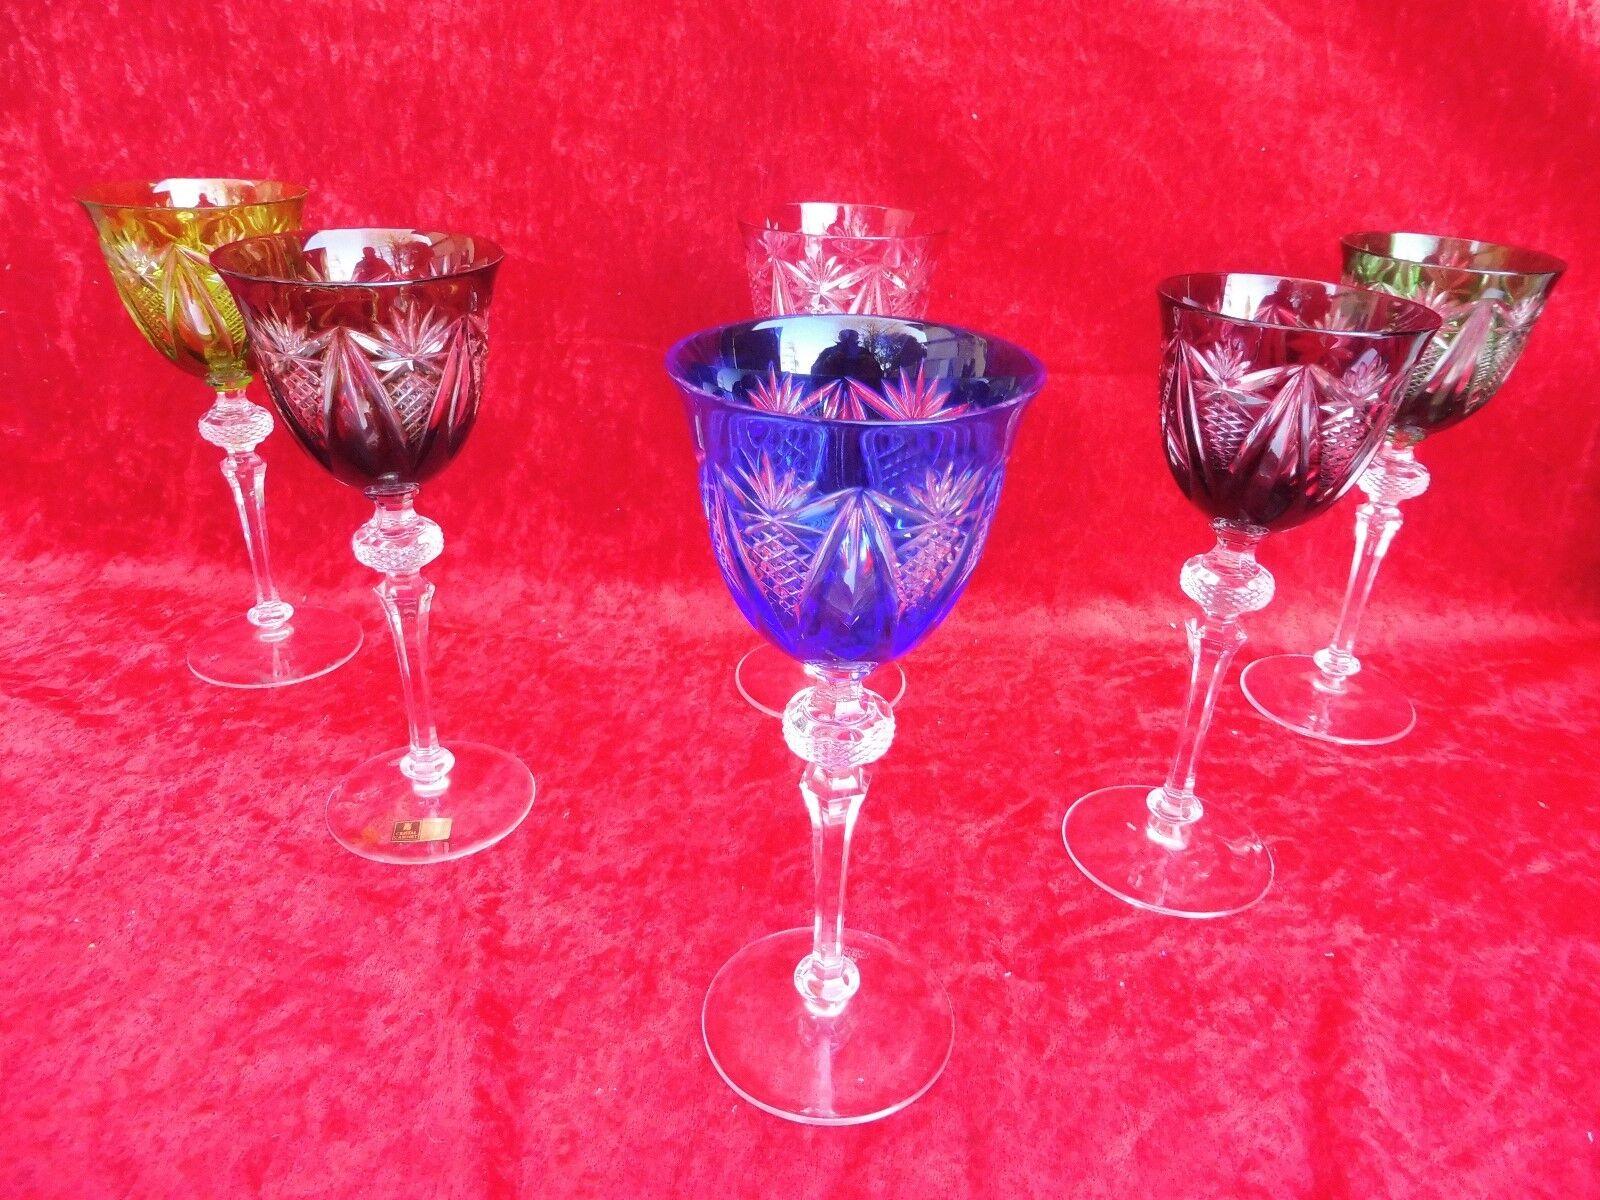 6 Noble, Grand Vin-Romains __ bleikristall poncé __ WMF Cabinet ___ 22,5cm_ _